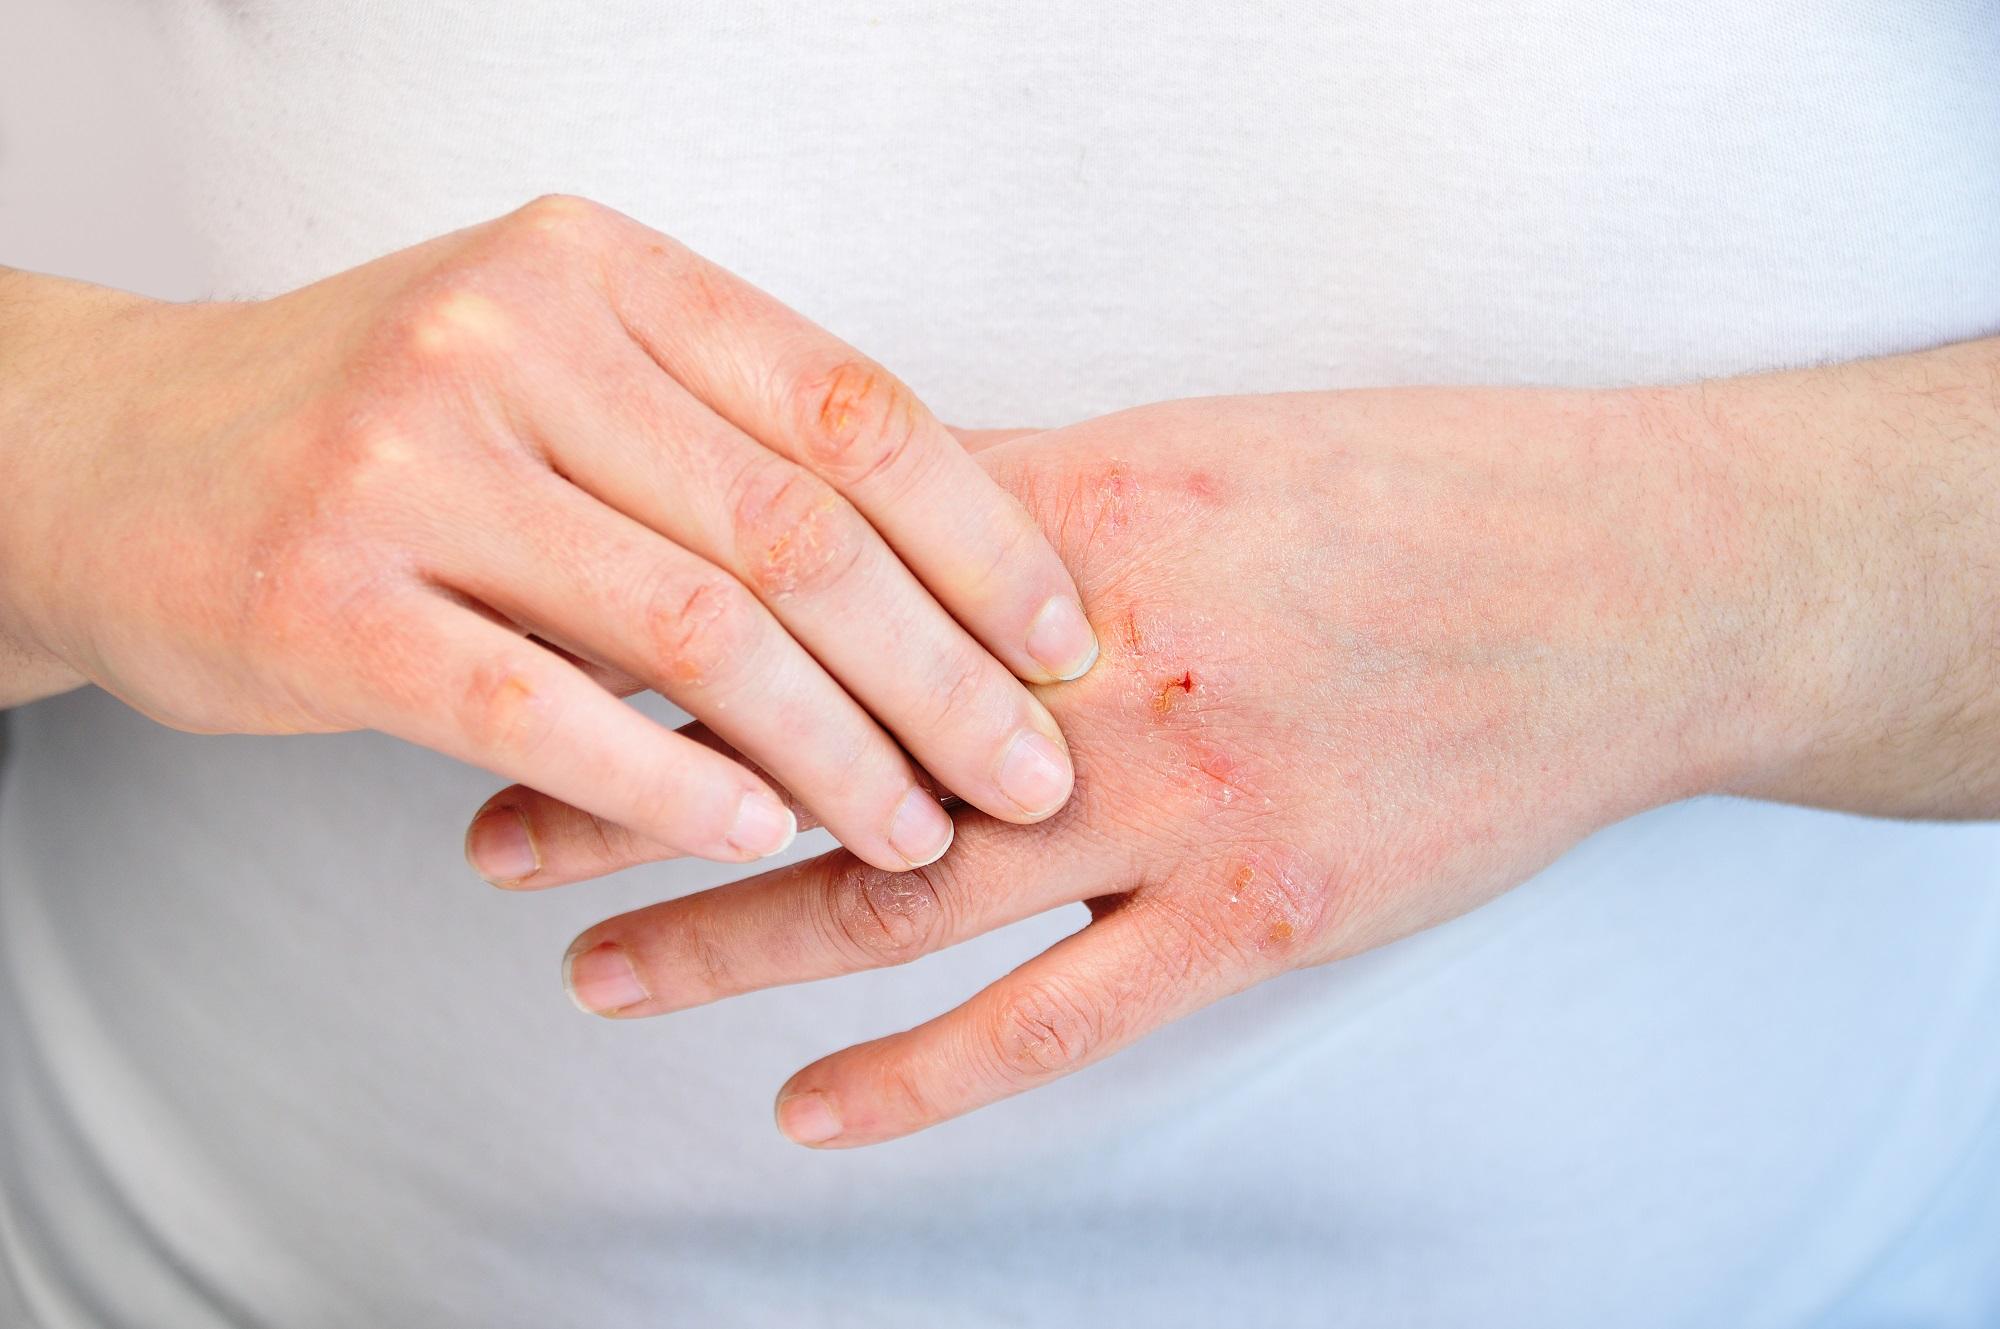 Atopikus dermatitisz